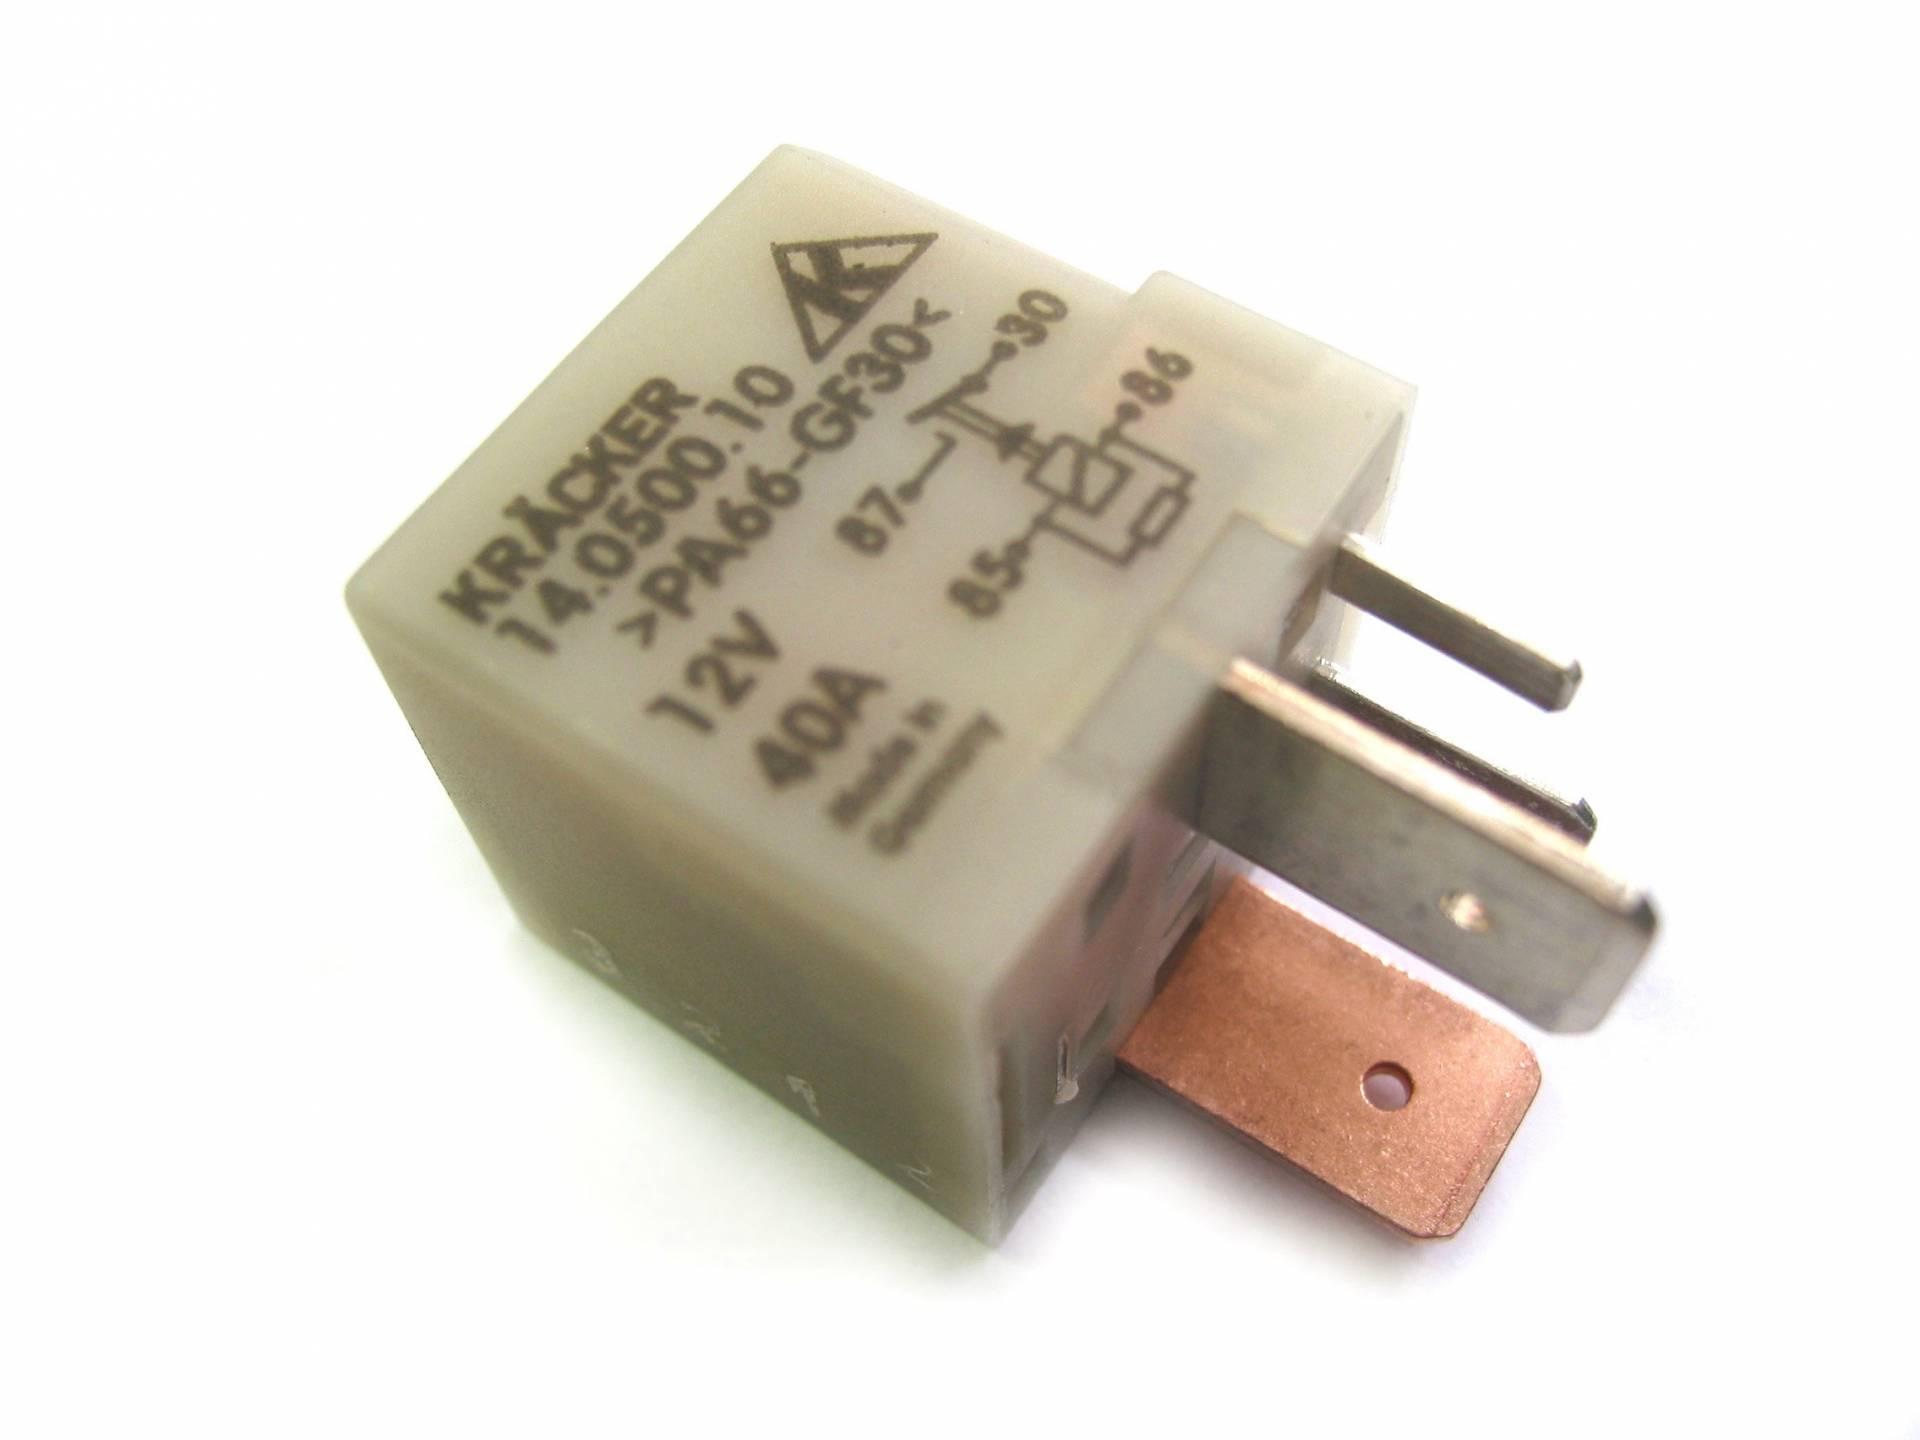 Bapmic 1J0906381A Relais Multifunktionsrelais 4-polig 40A